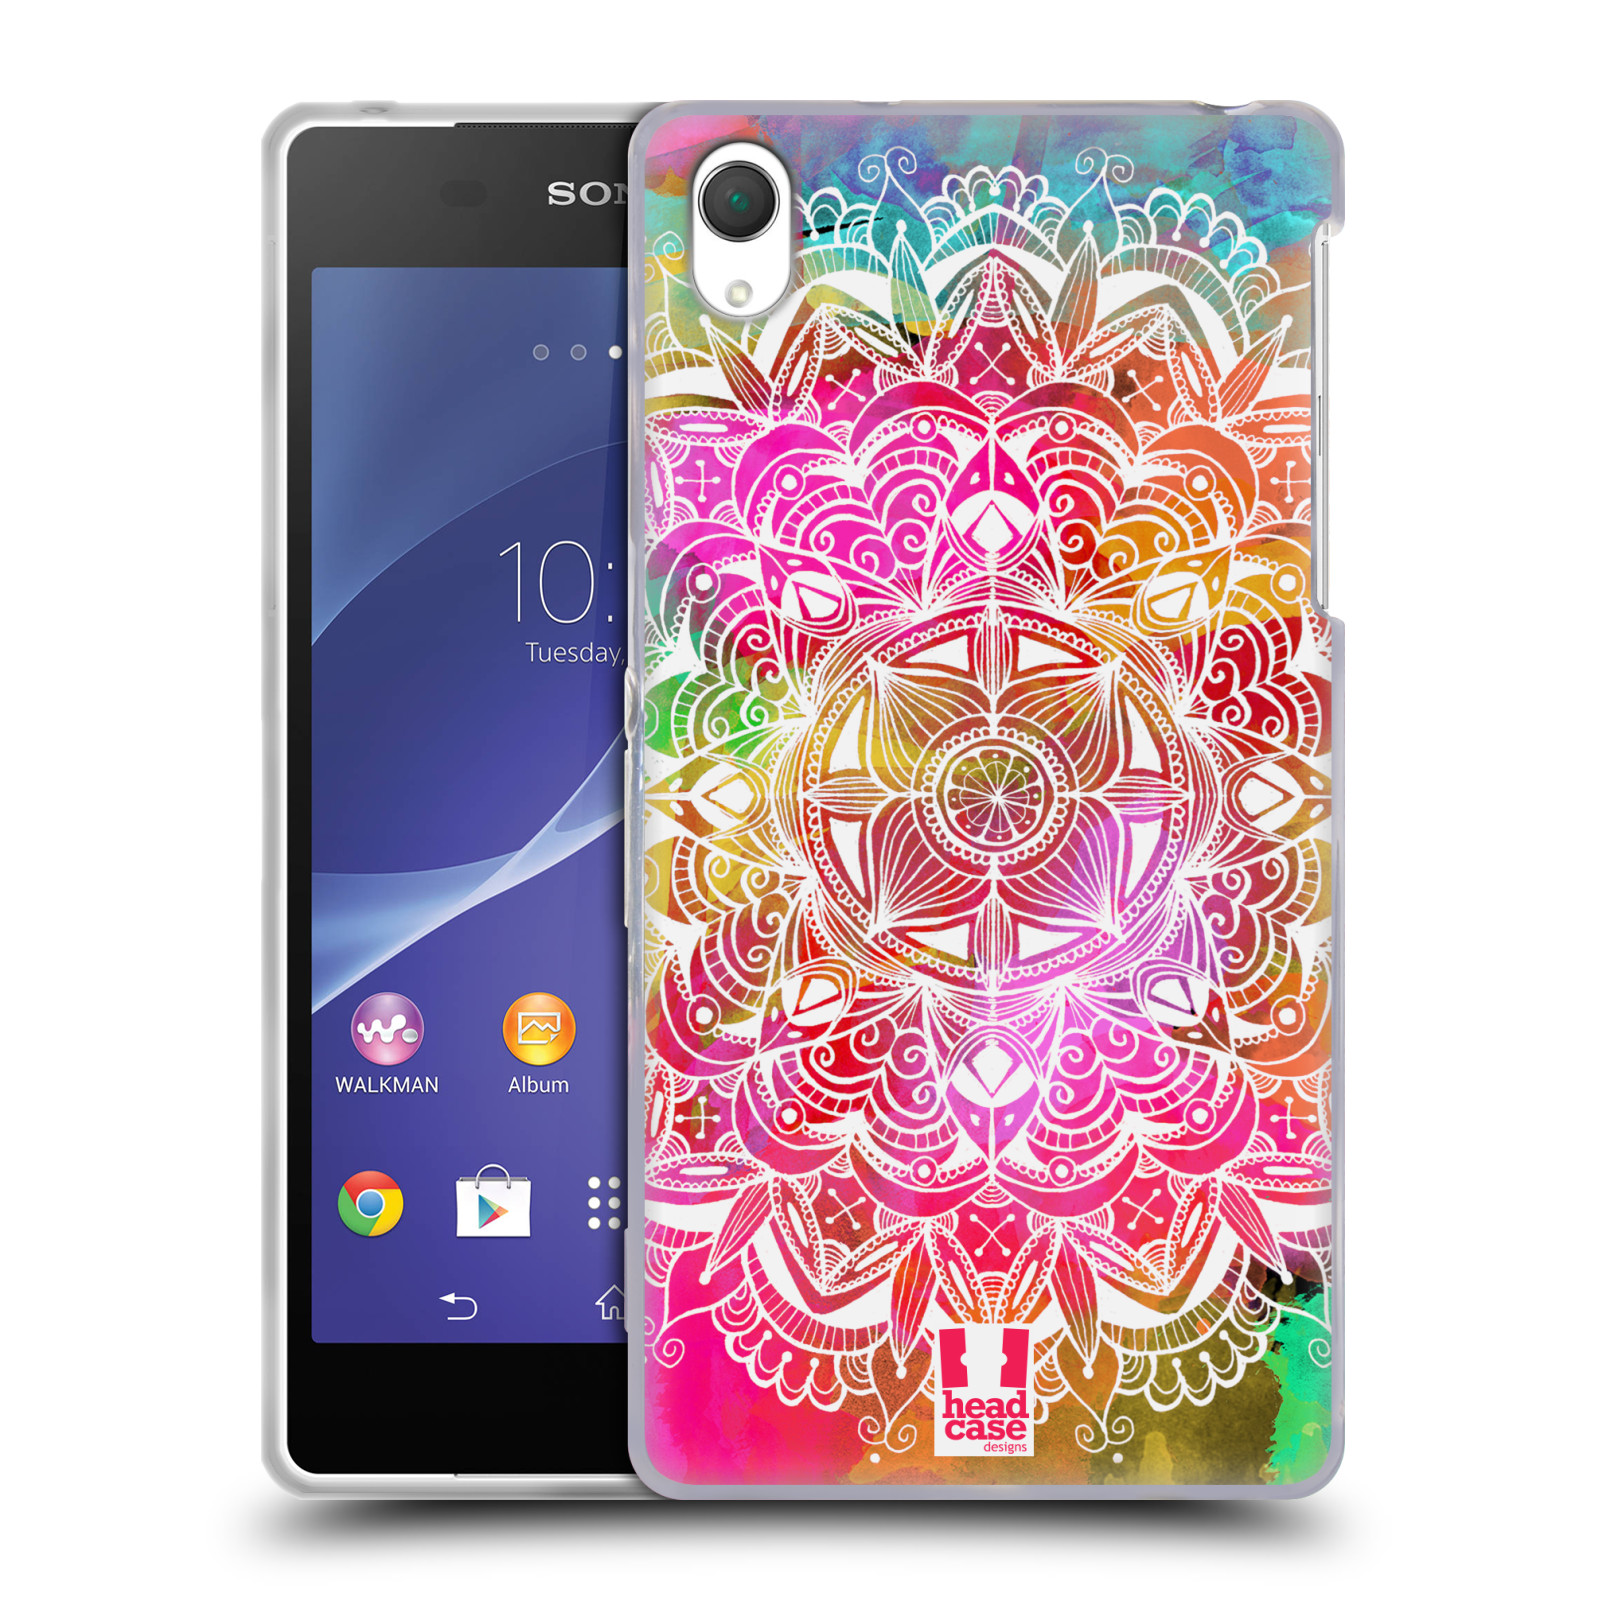 Silikonové pouzdro na mobil Sony Xperia Z2 D6503 HEAD CASE Mandala Doodle Watercolour (Silikonový kryt či obal na mobilní telefon Sony Xperia Z2)